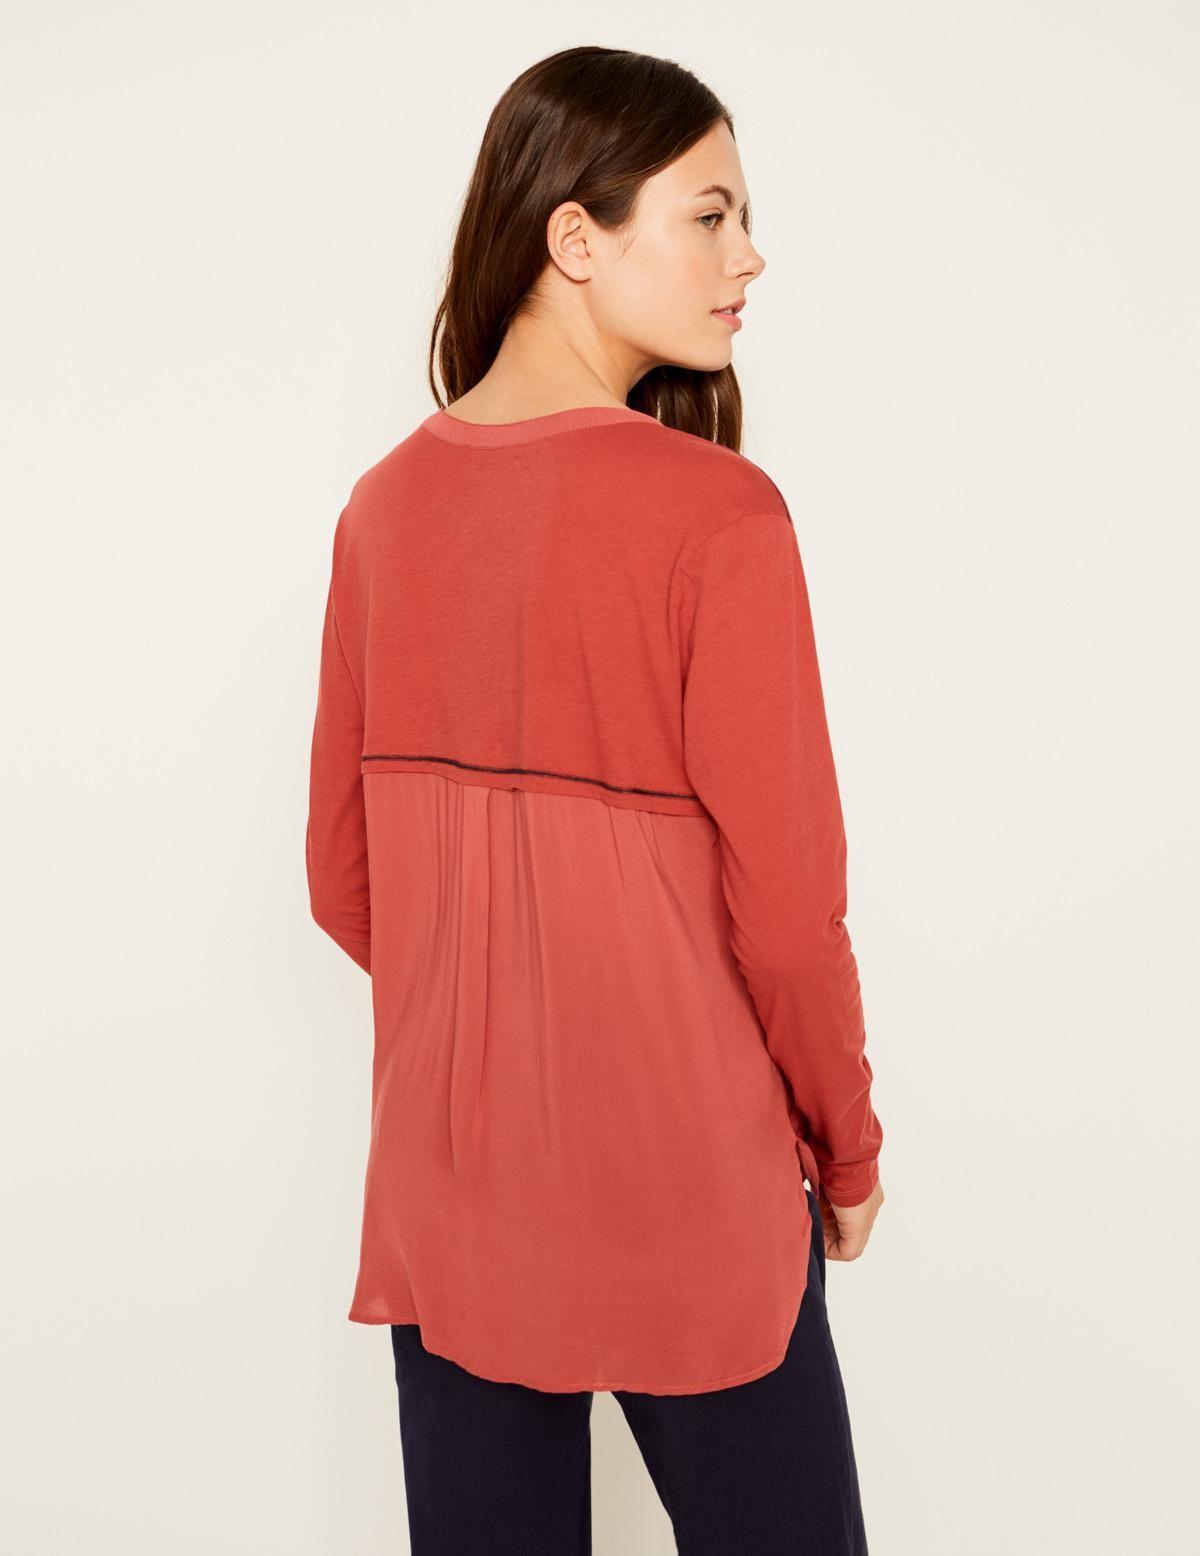 Camiseta tejido combinado - Ítem1